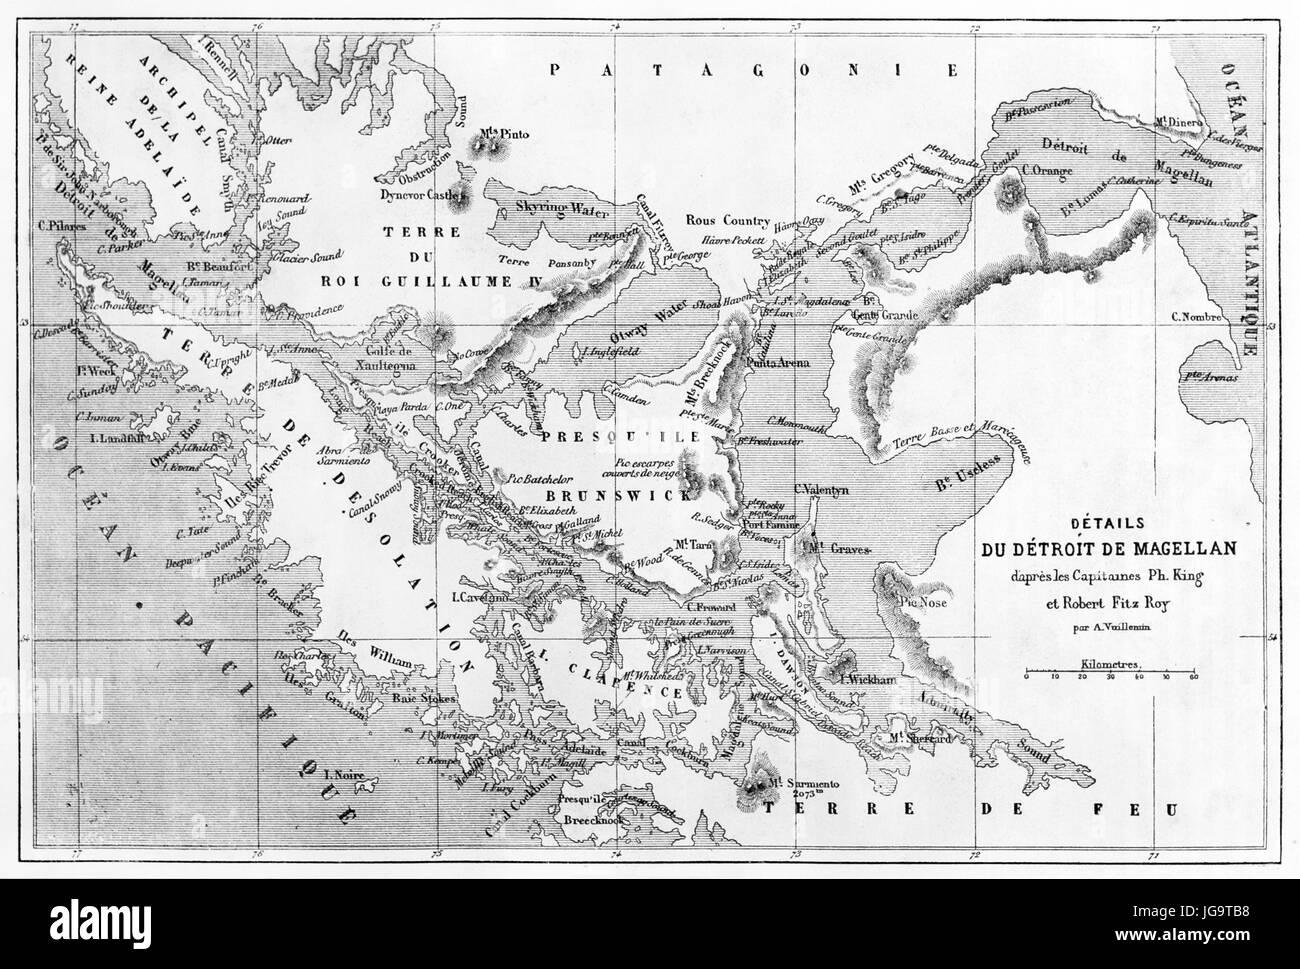 Strait of Magellan old map. Created by Erhard and Bonaparte, published on Le Tour du Monde, Paris, 1861 - Stock Image